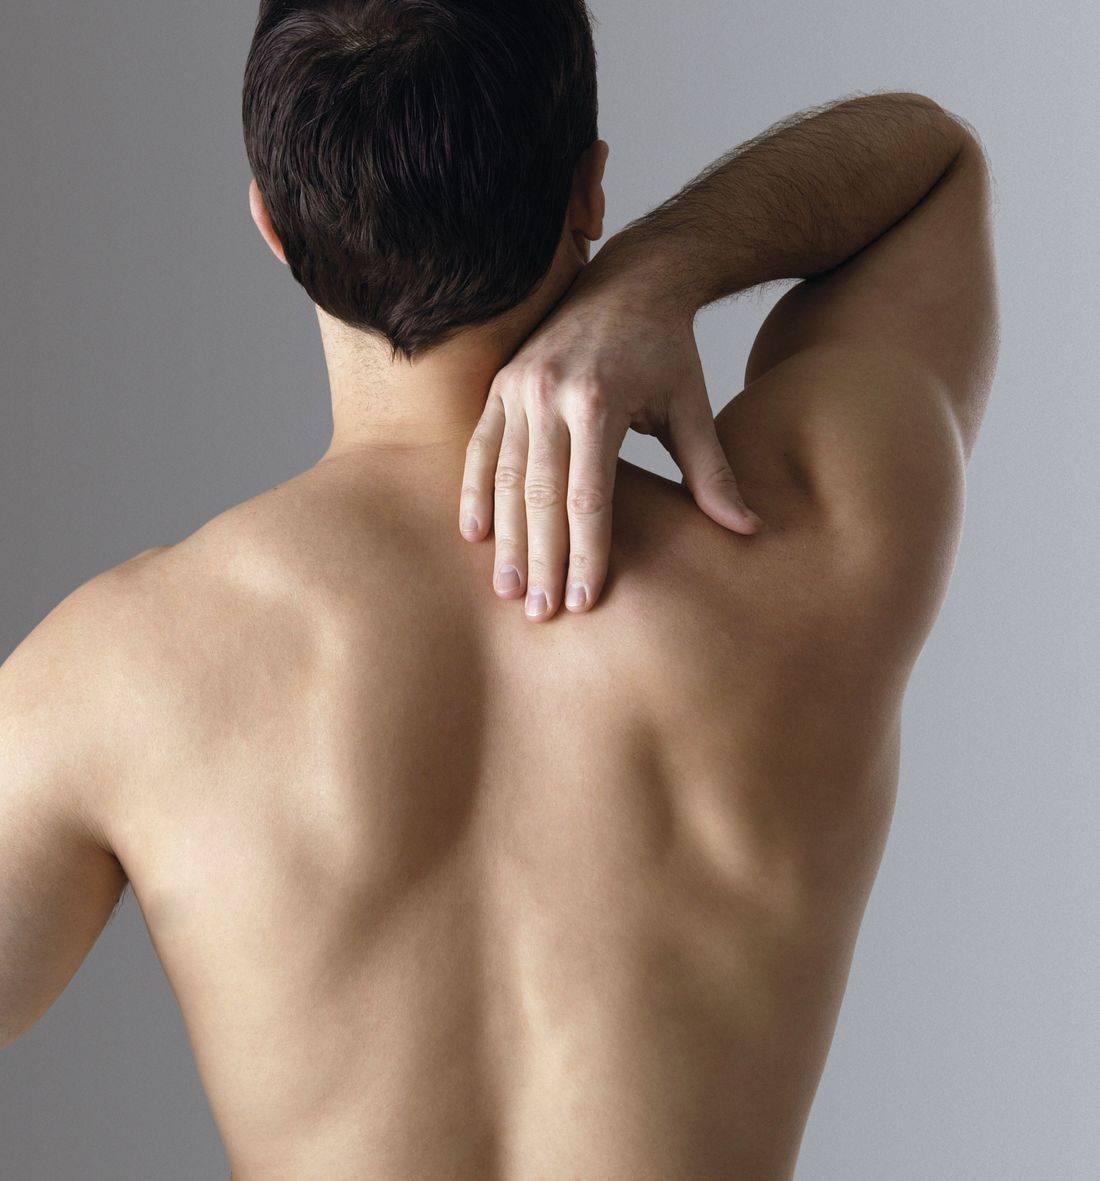 Massage to help manage muscular imbalance